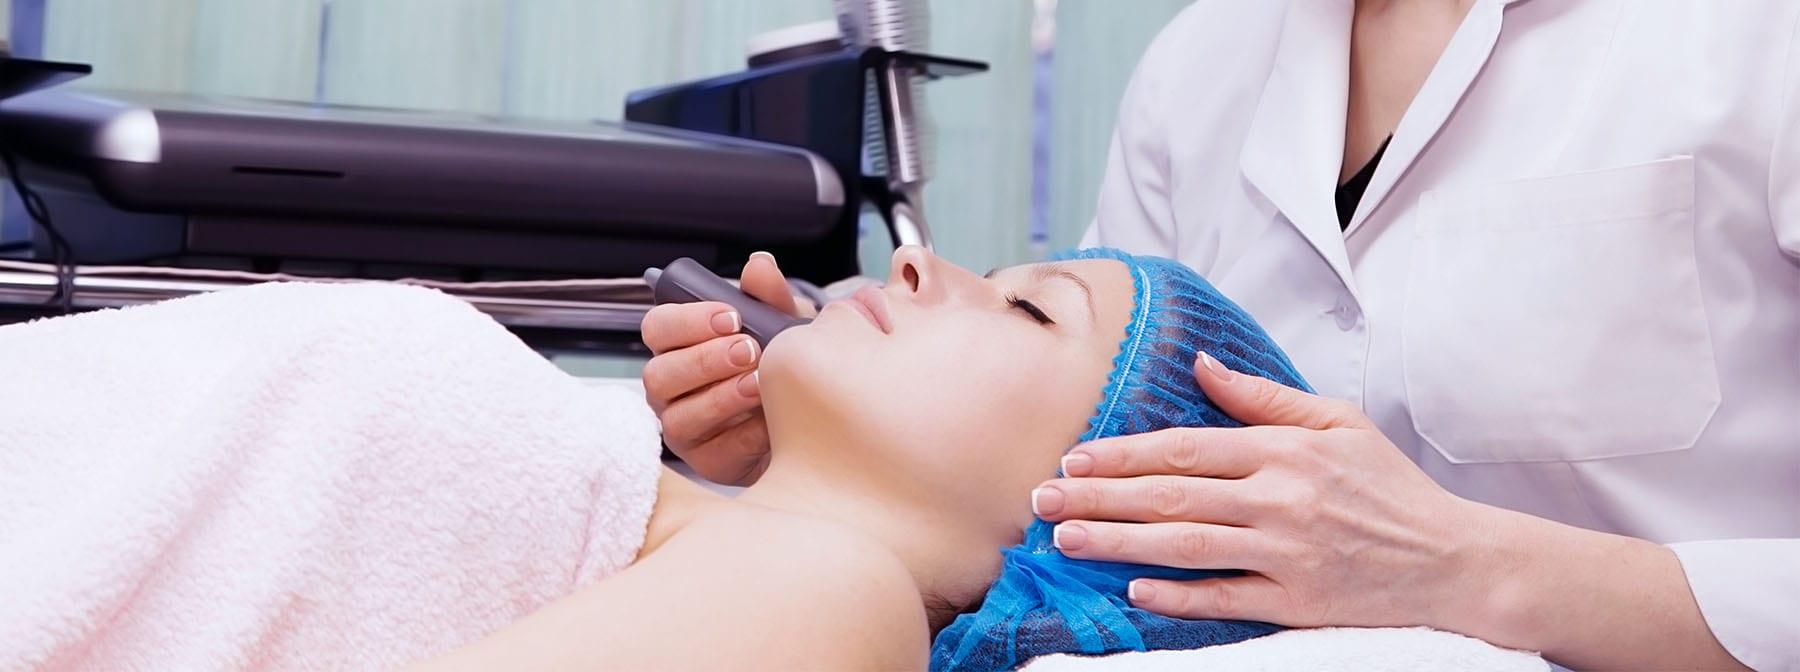 LED Light Therapy: The Futuristic Way to Do Skincare